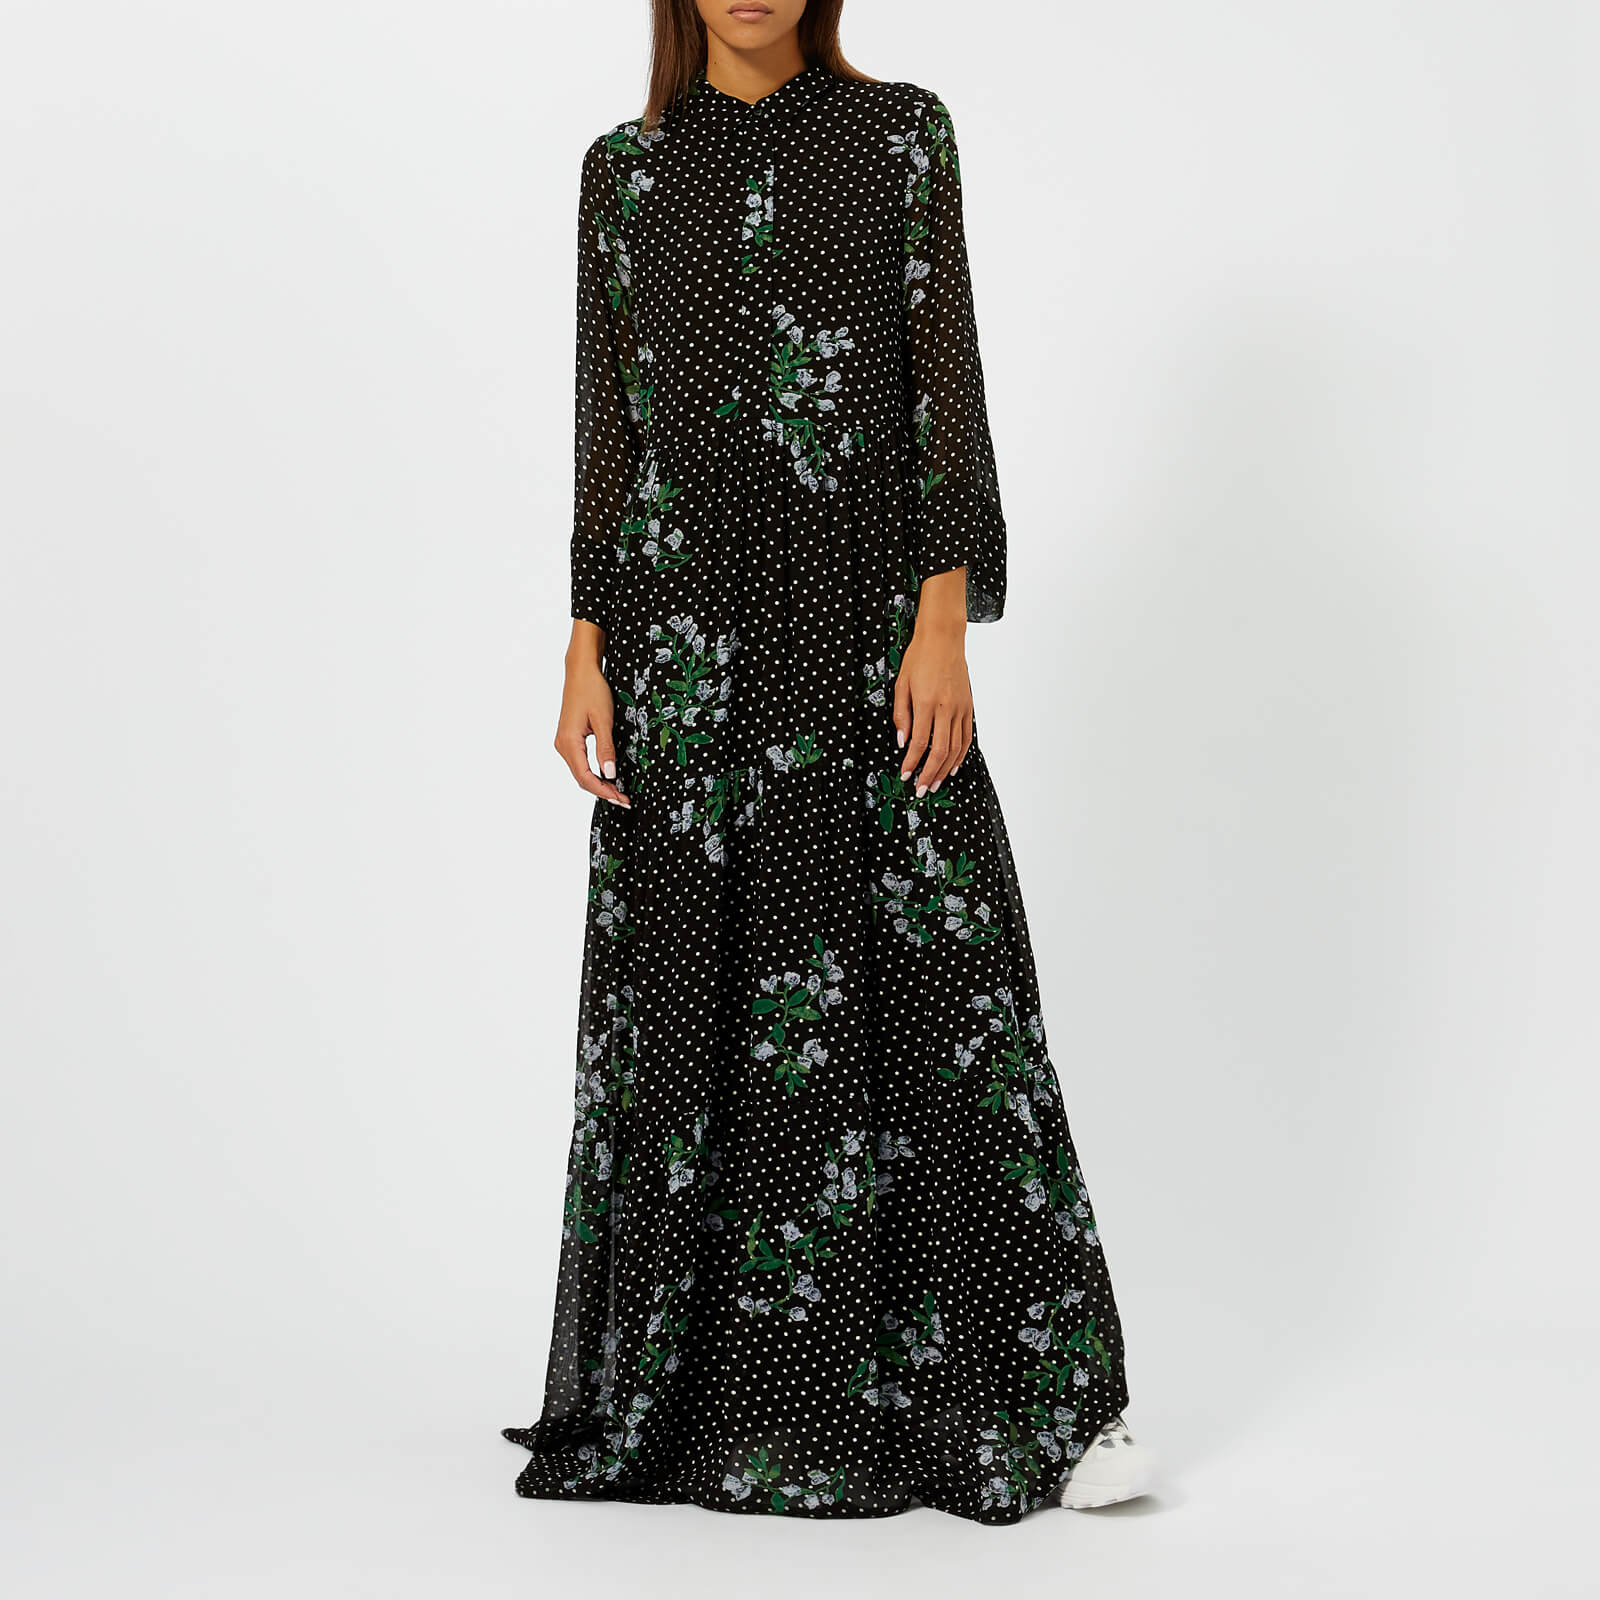 e59d0e7657d2 Ganni Women's Rometty Georgette Dress - Black - Free UK Delivery over £50